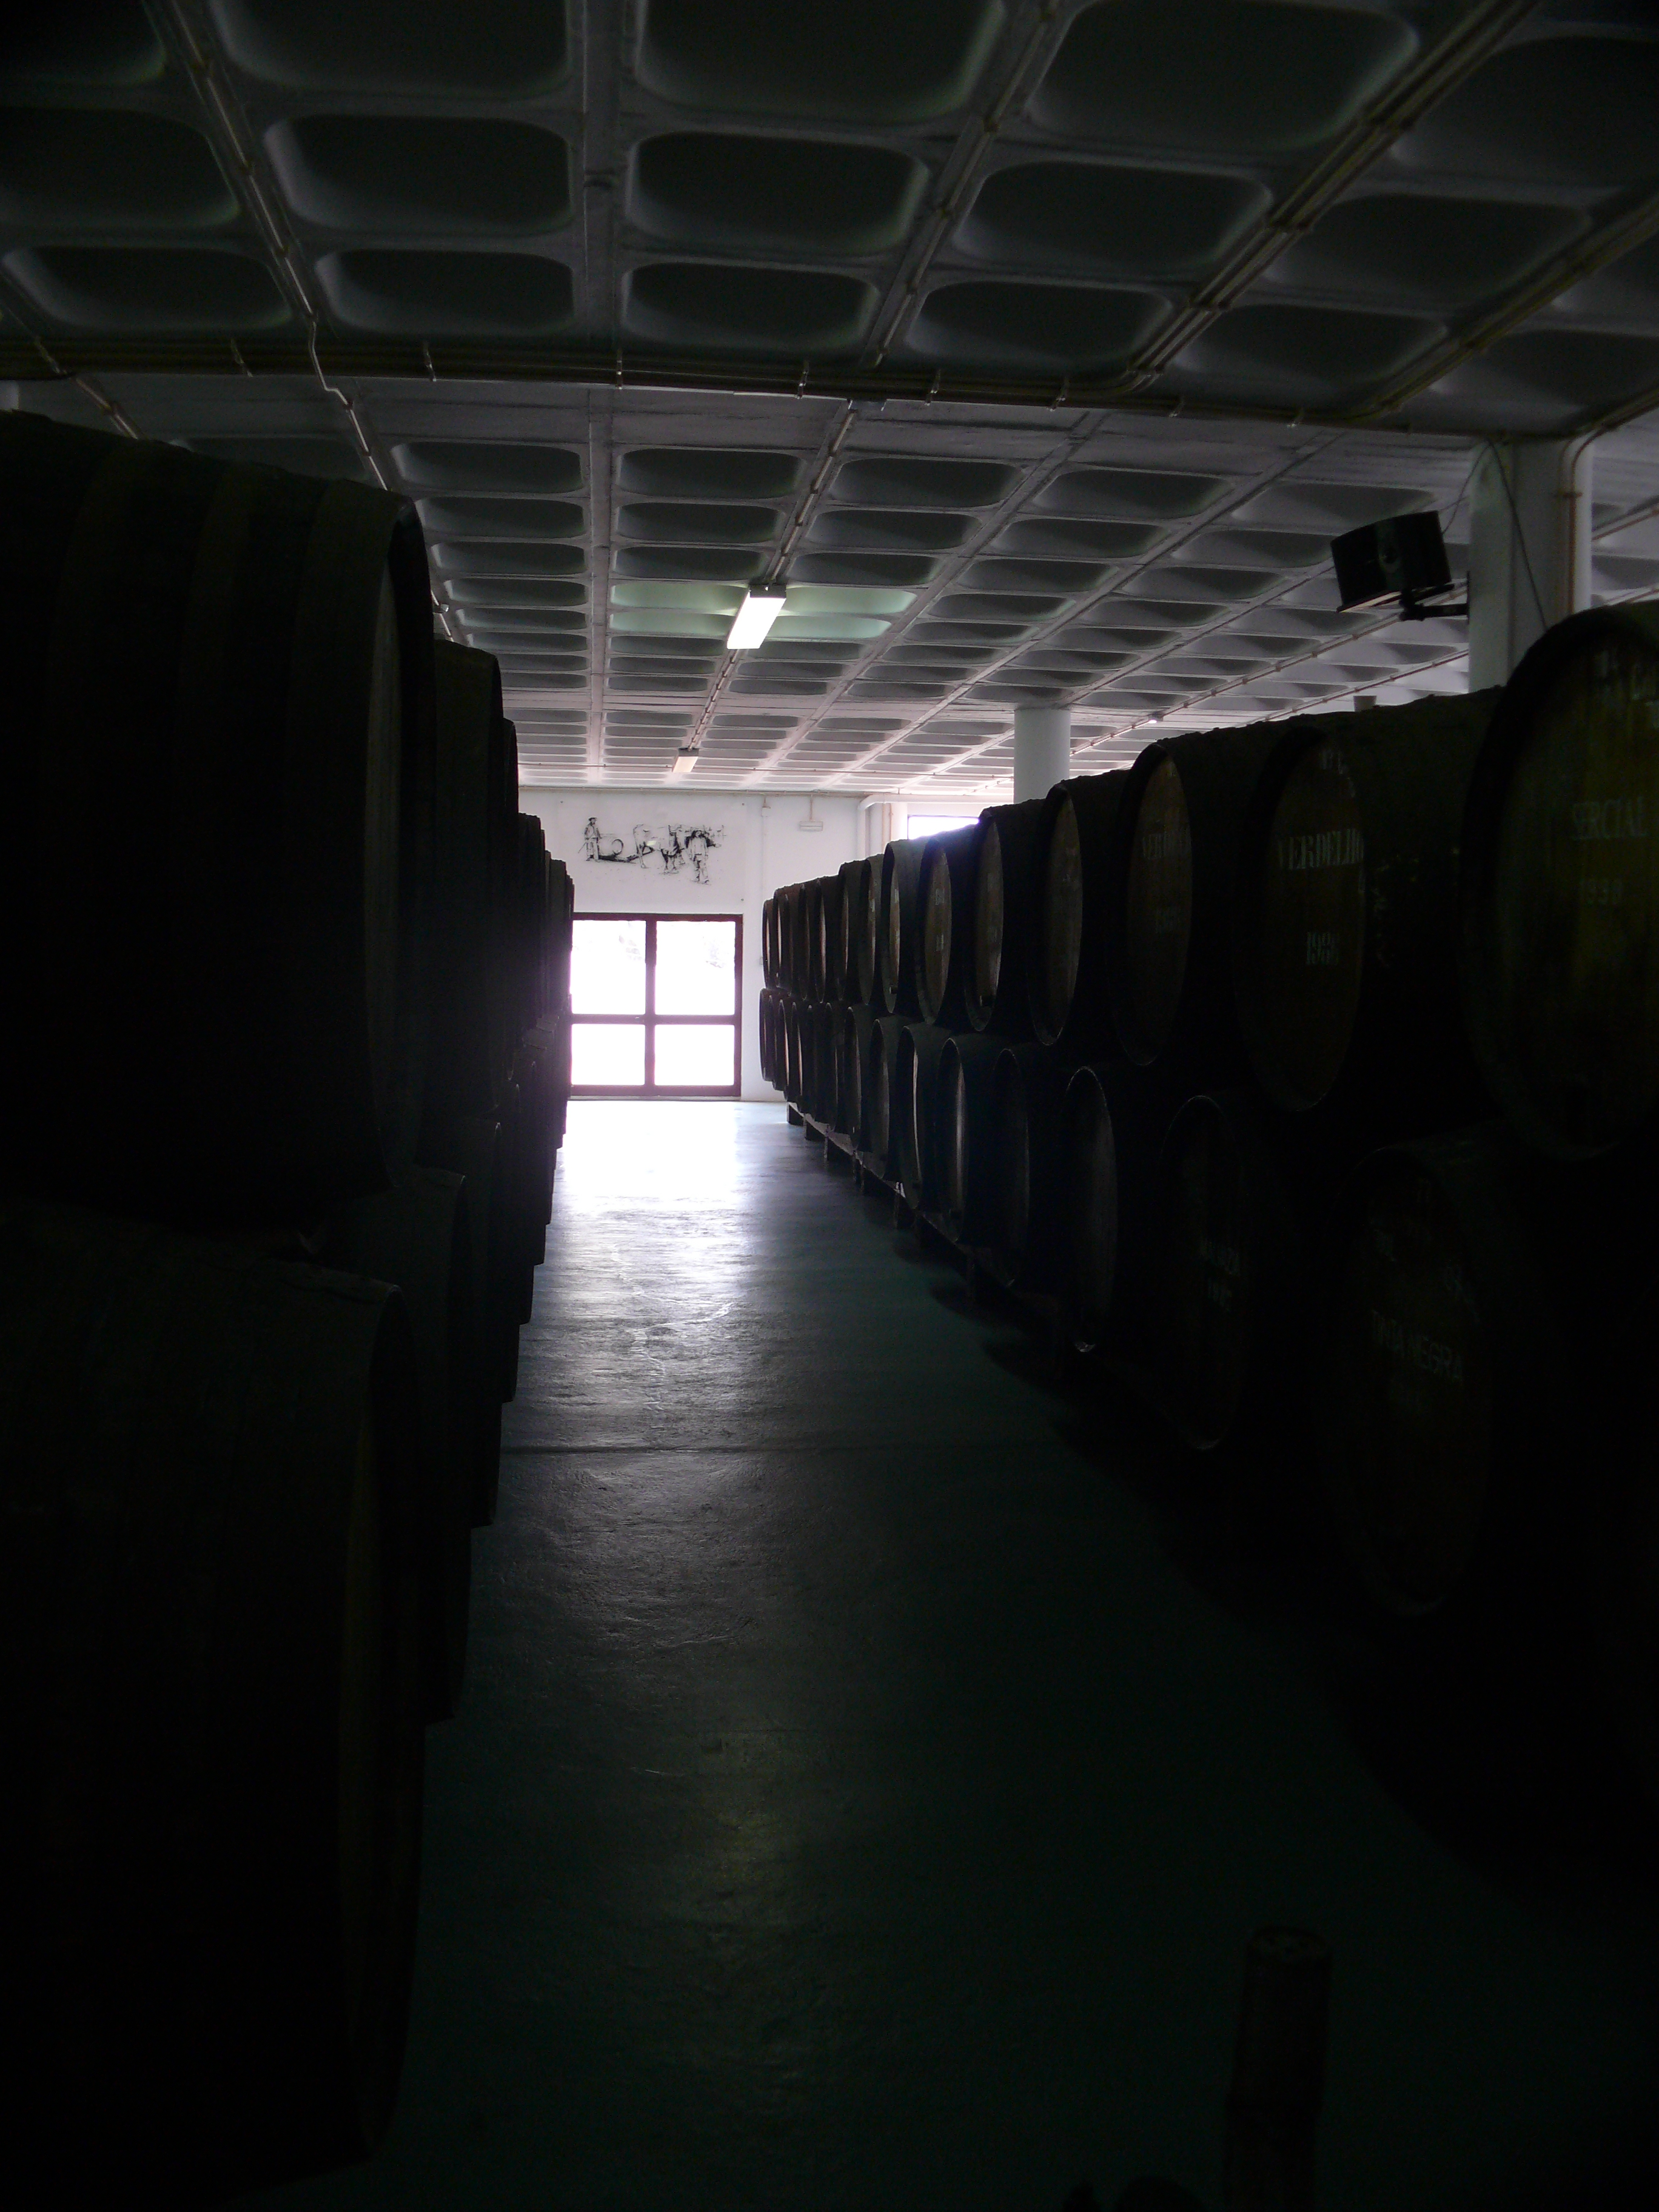 Canteiro aging of Madeira wine